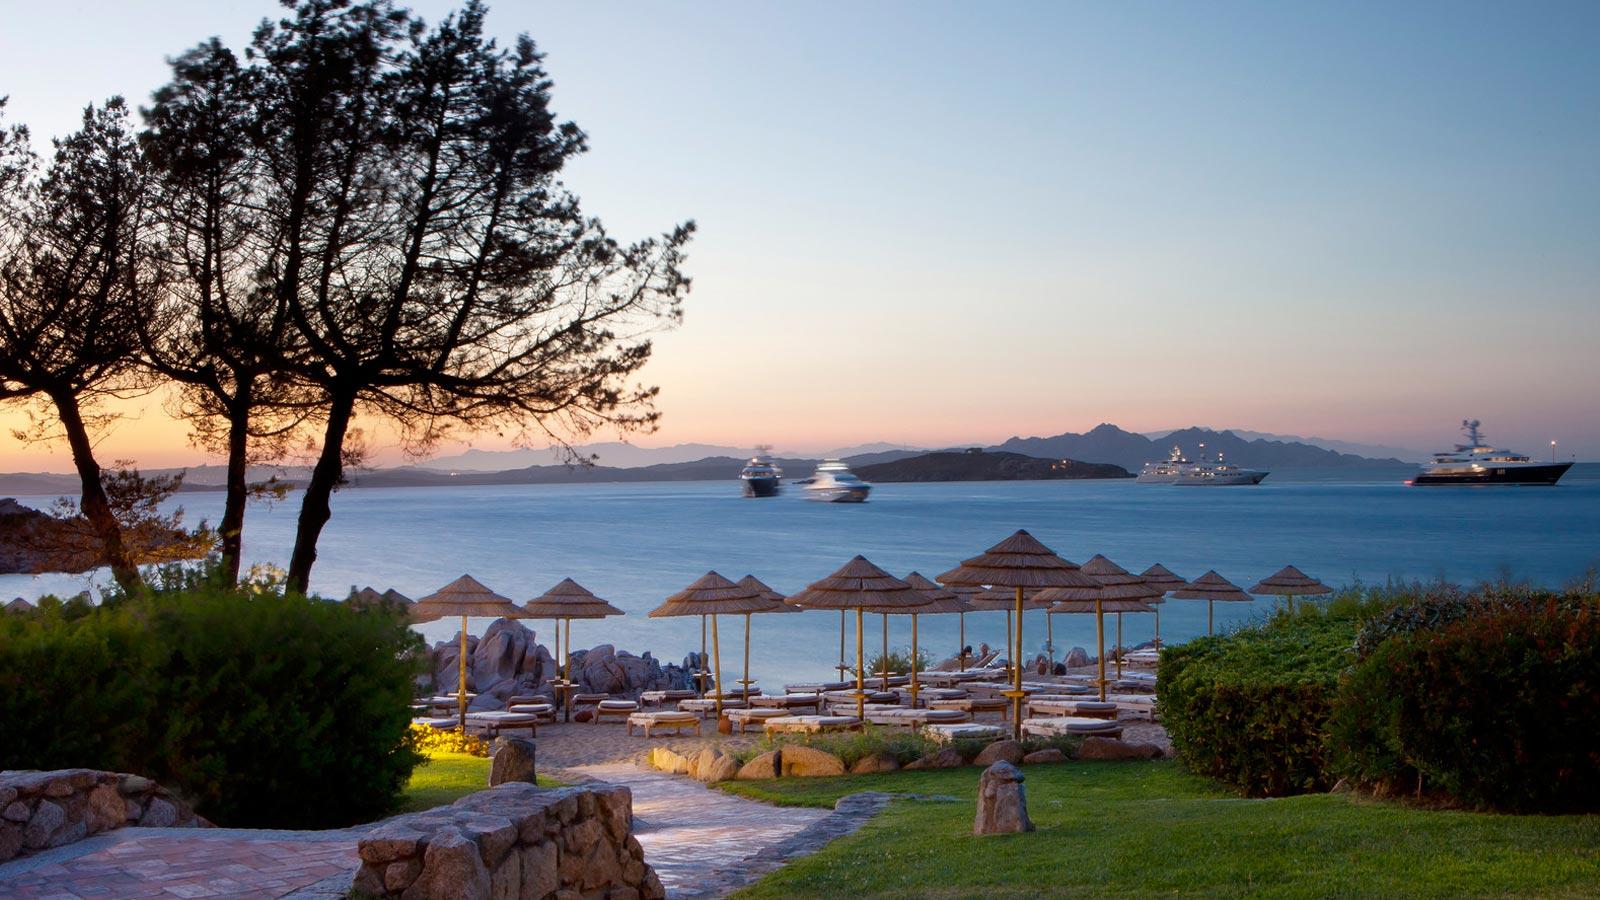 Top 6 Best Luxury Hotels With Private Beach In Costa Smeralda